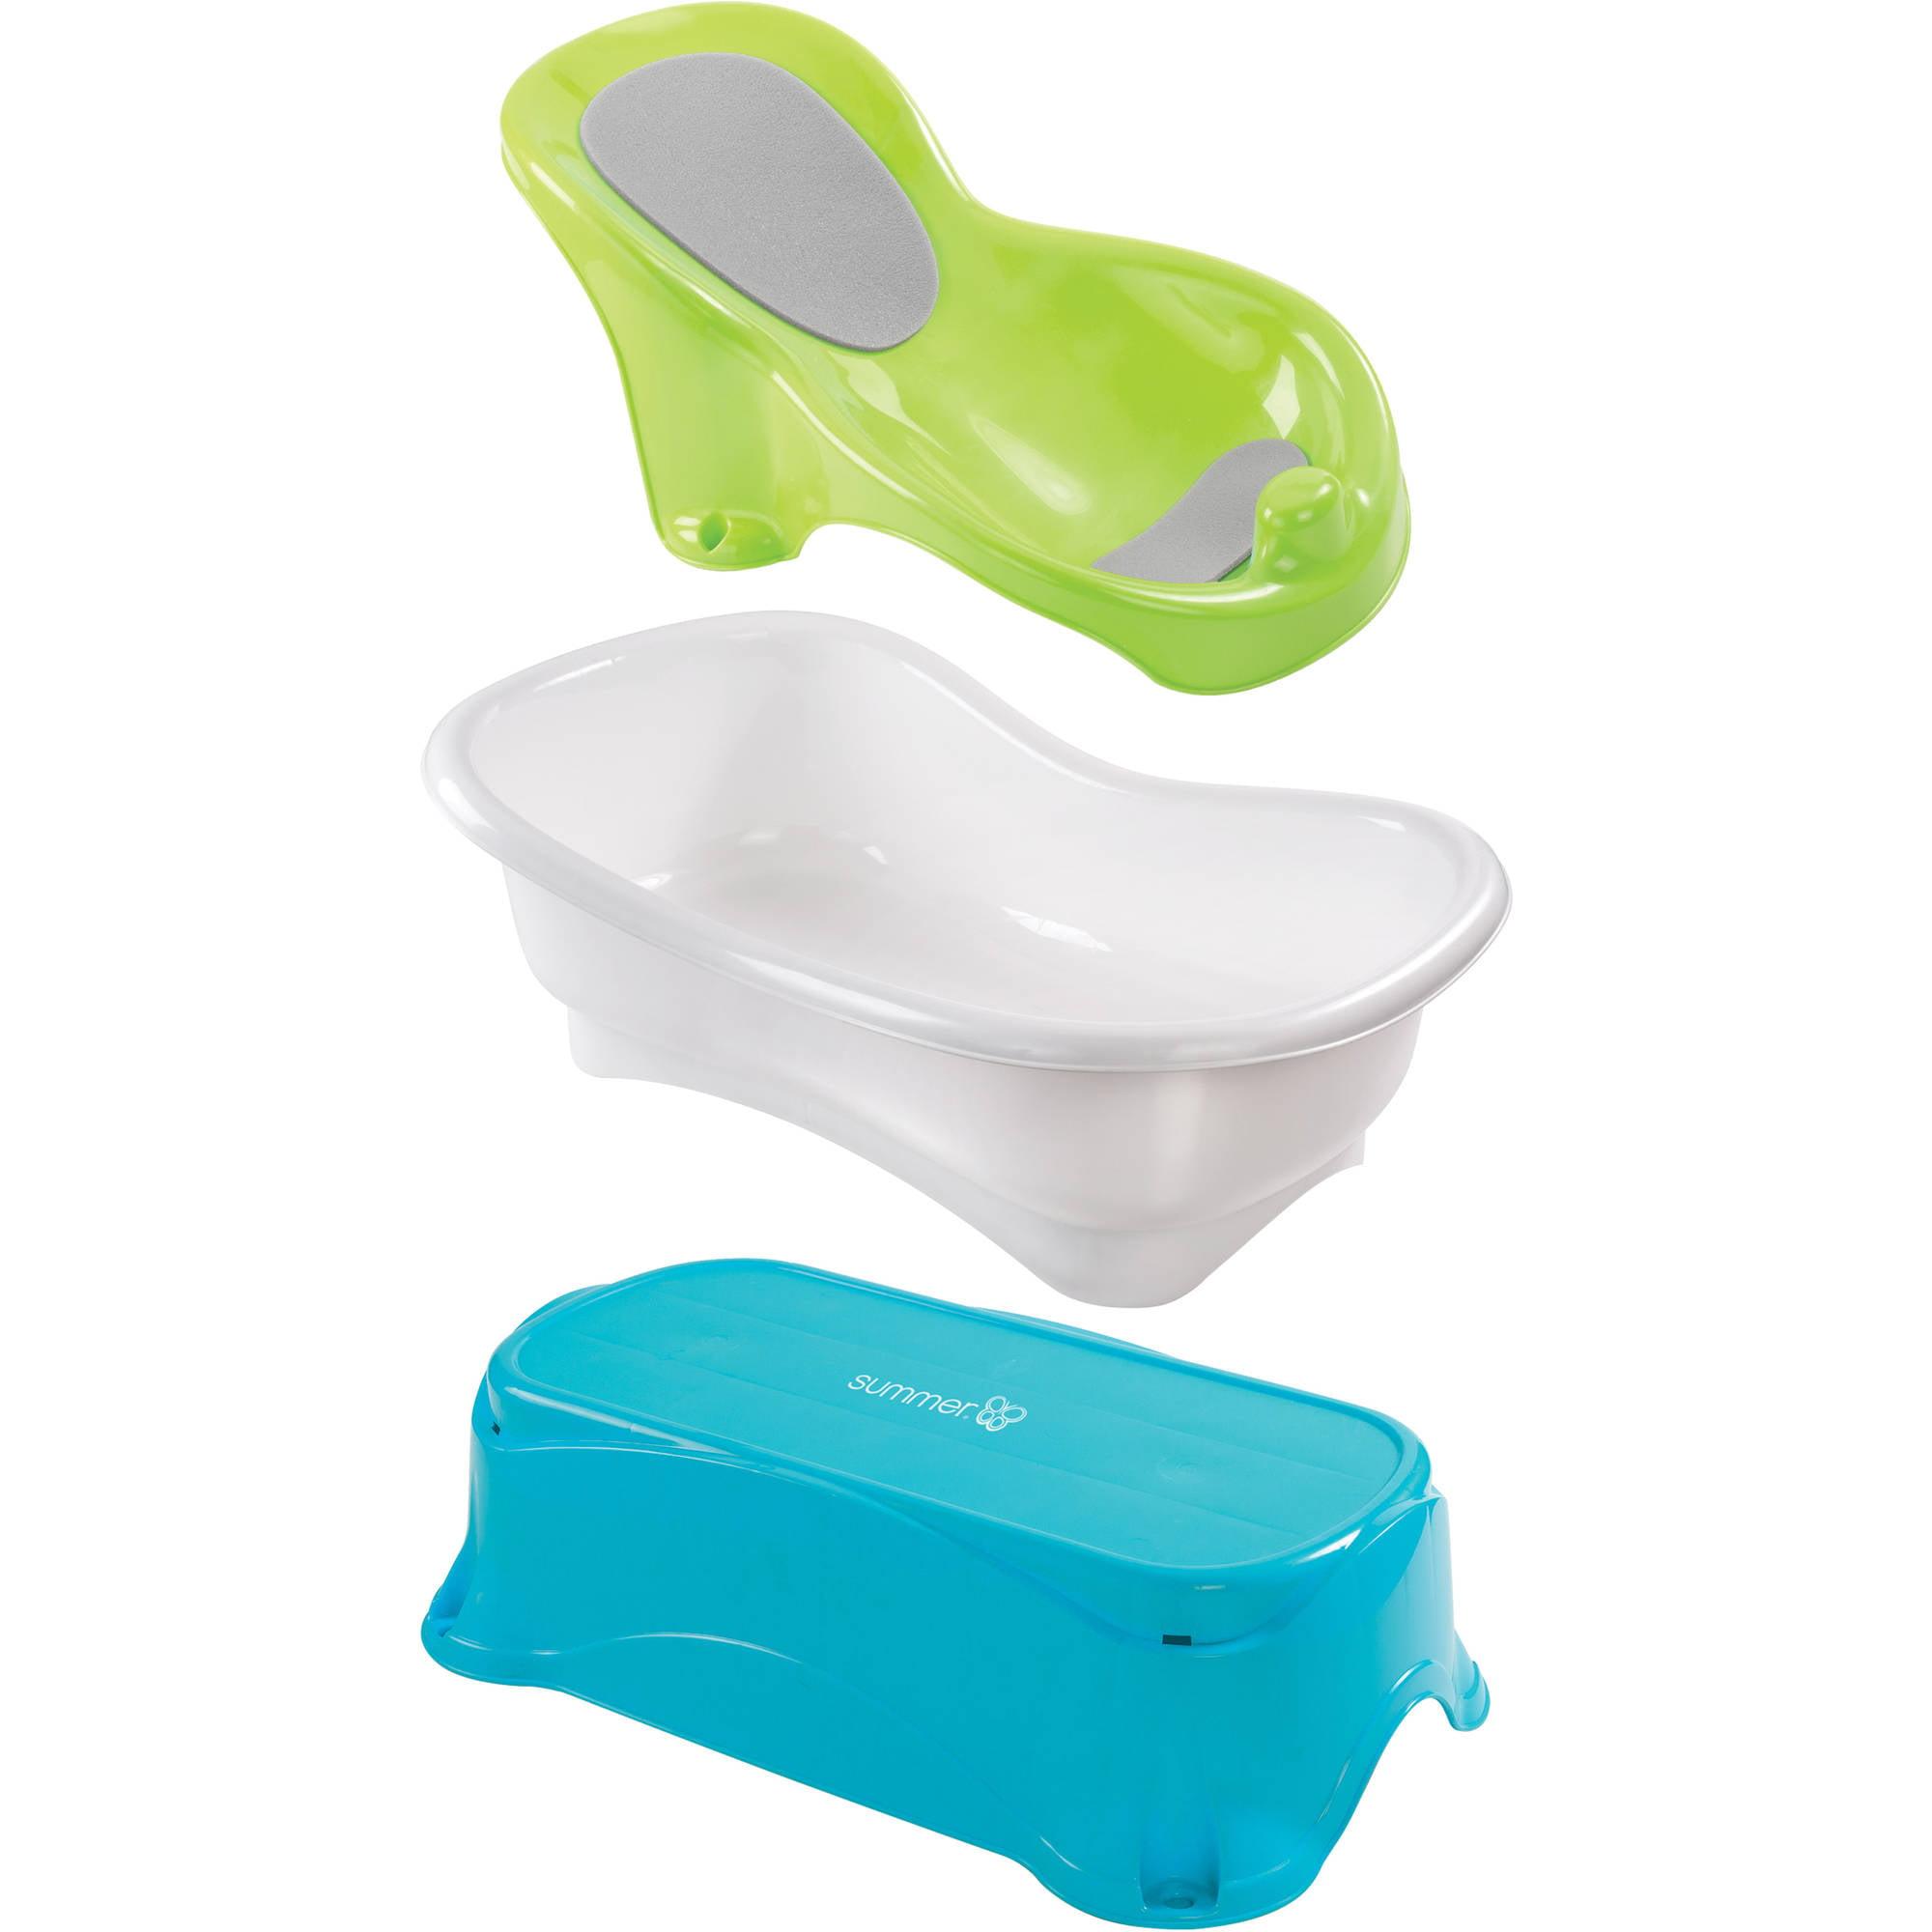 Summer Infant Comfort Height Bath Tub - Walmart.com